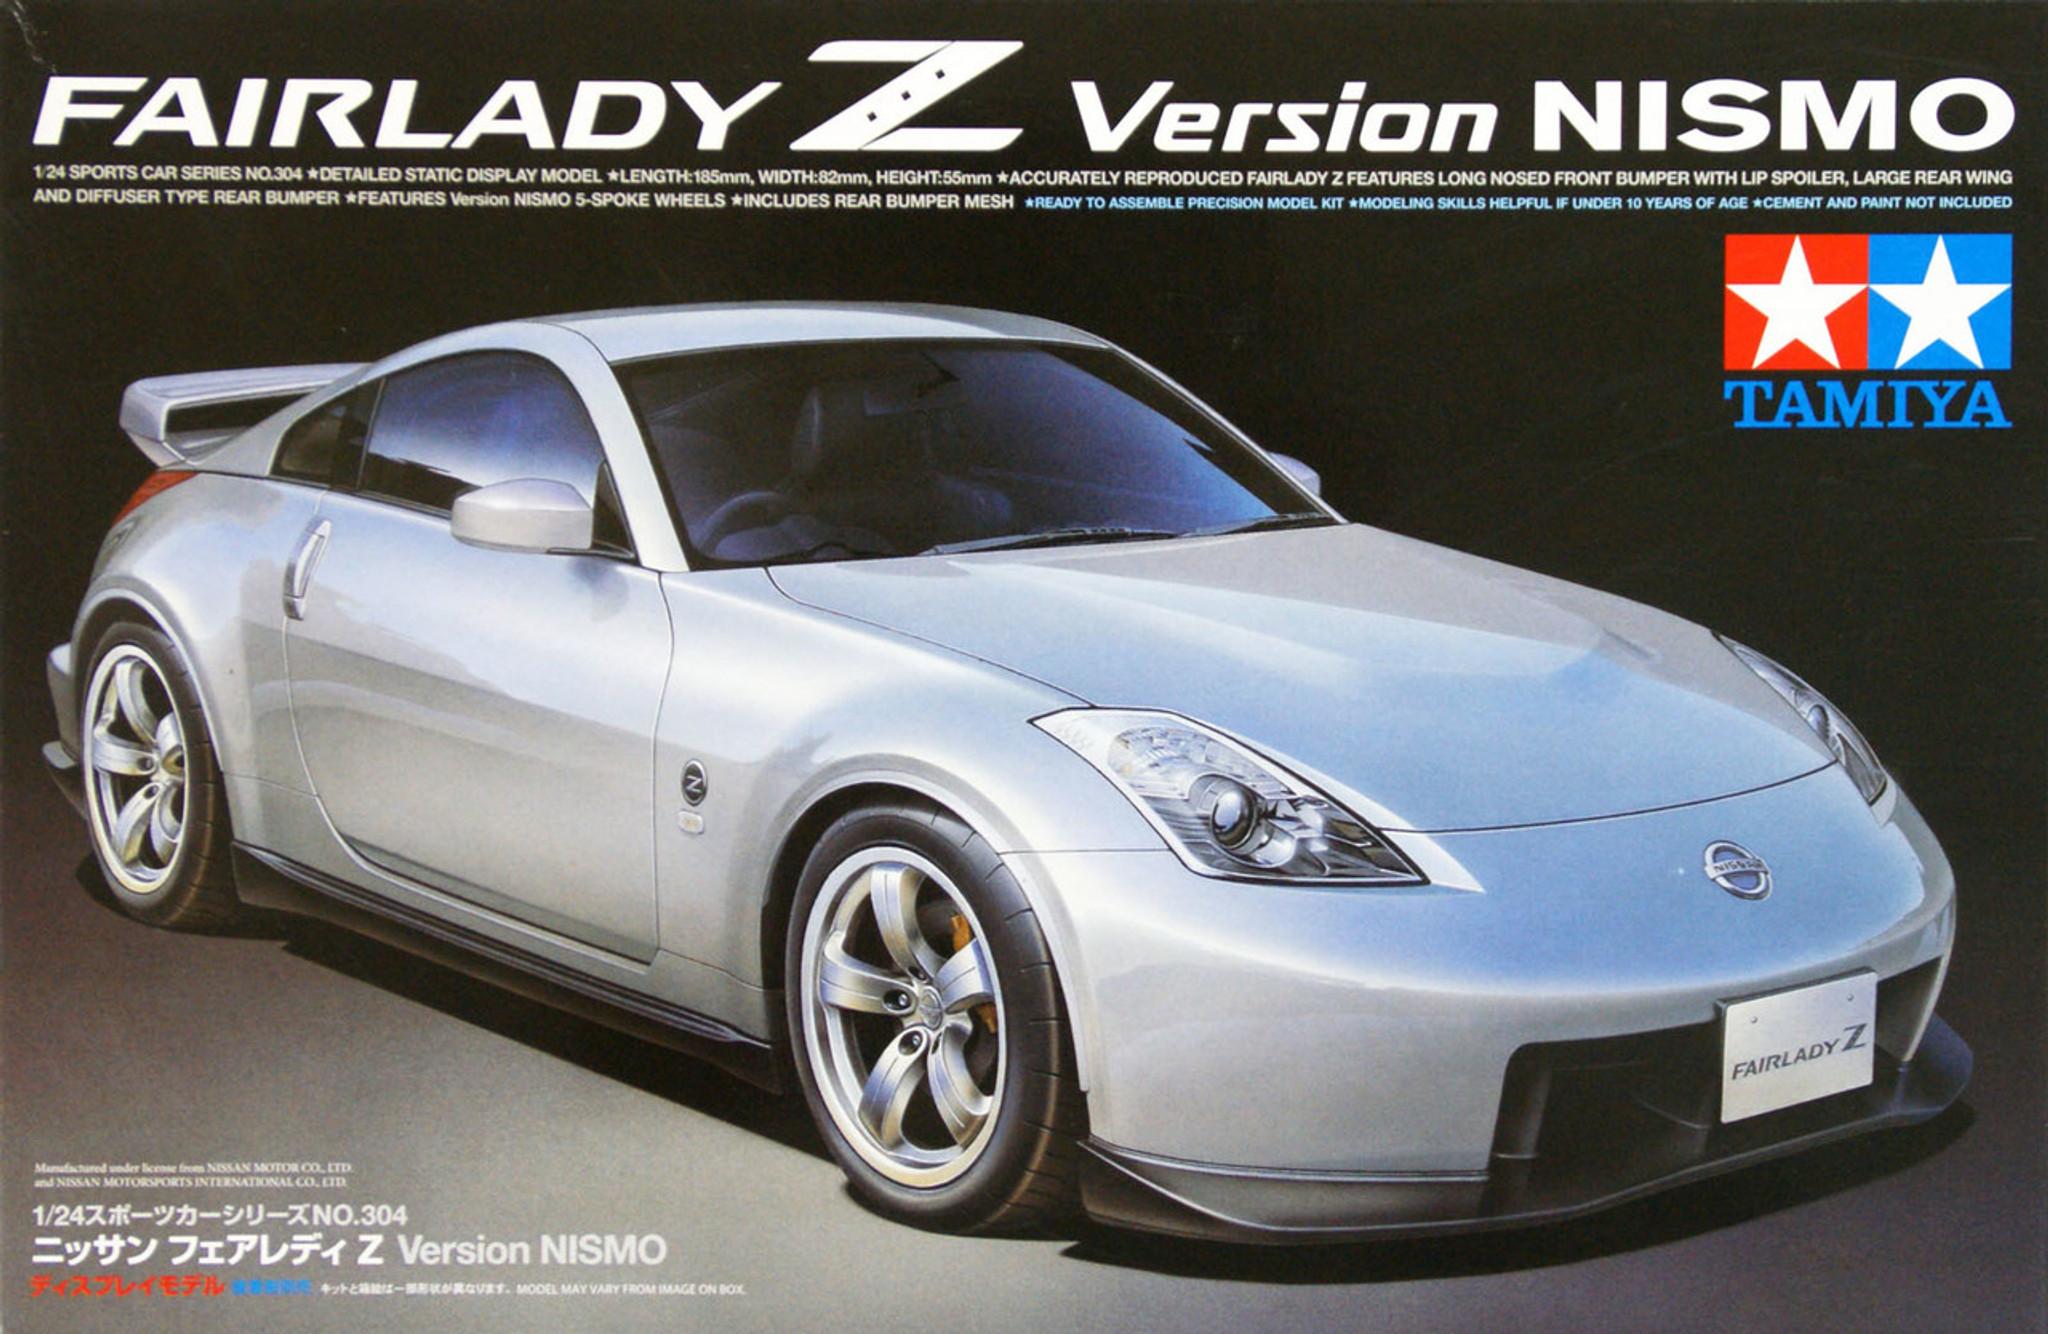 Nissan Fairlady Z >> Tamiya 24304 Nissan Fairlady Z Version Nismo 1 24 Scale Kit Plaza